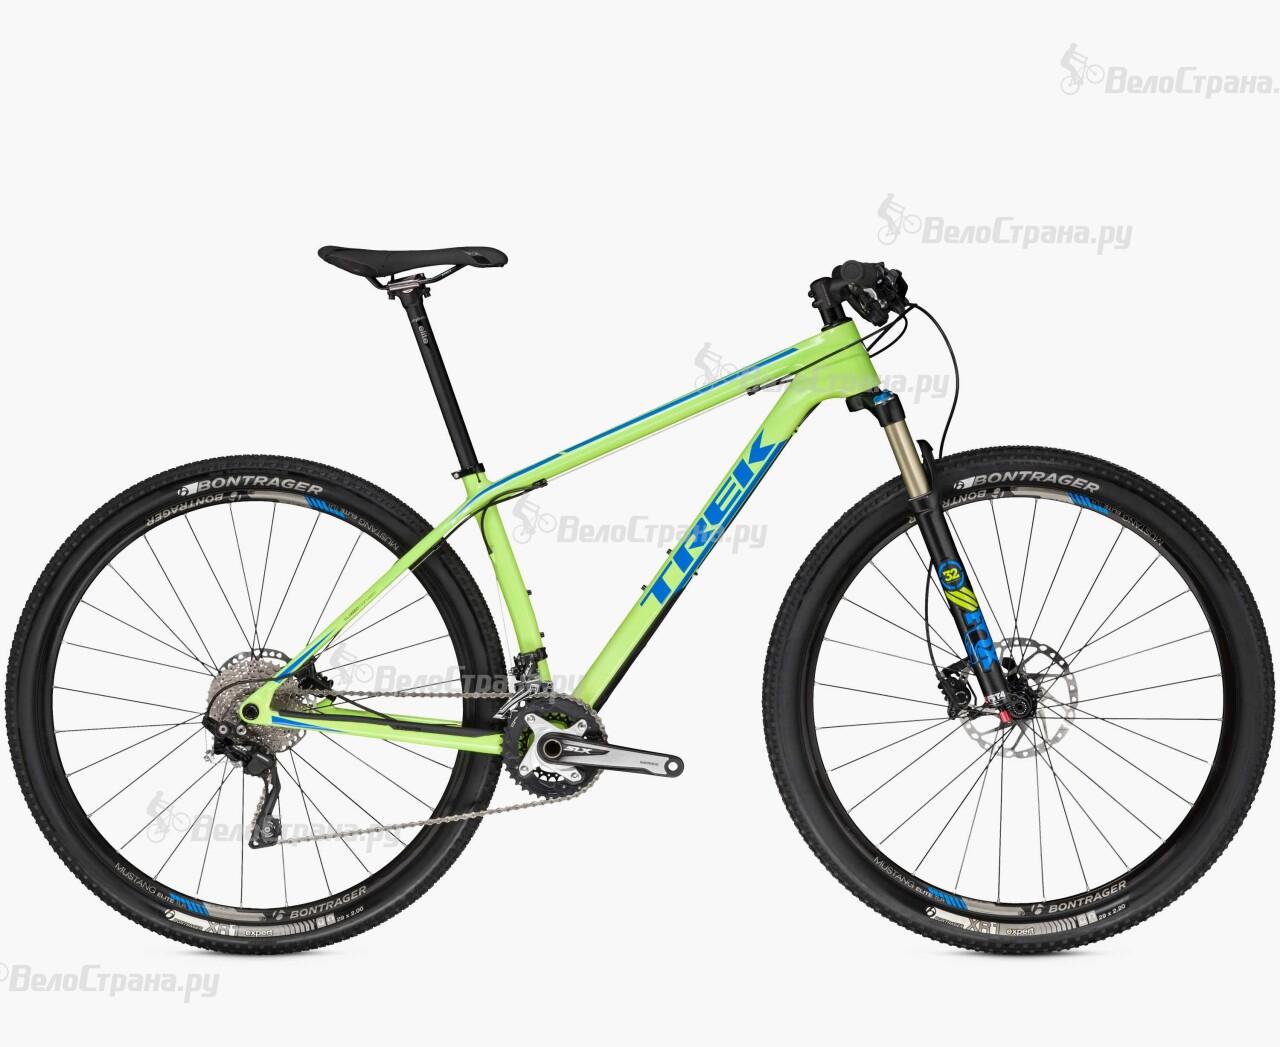 Велосипед Trek Superfly 9.7 27,5 (2016) цены онлайн